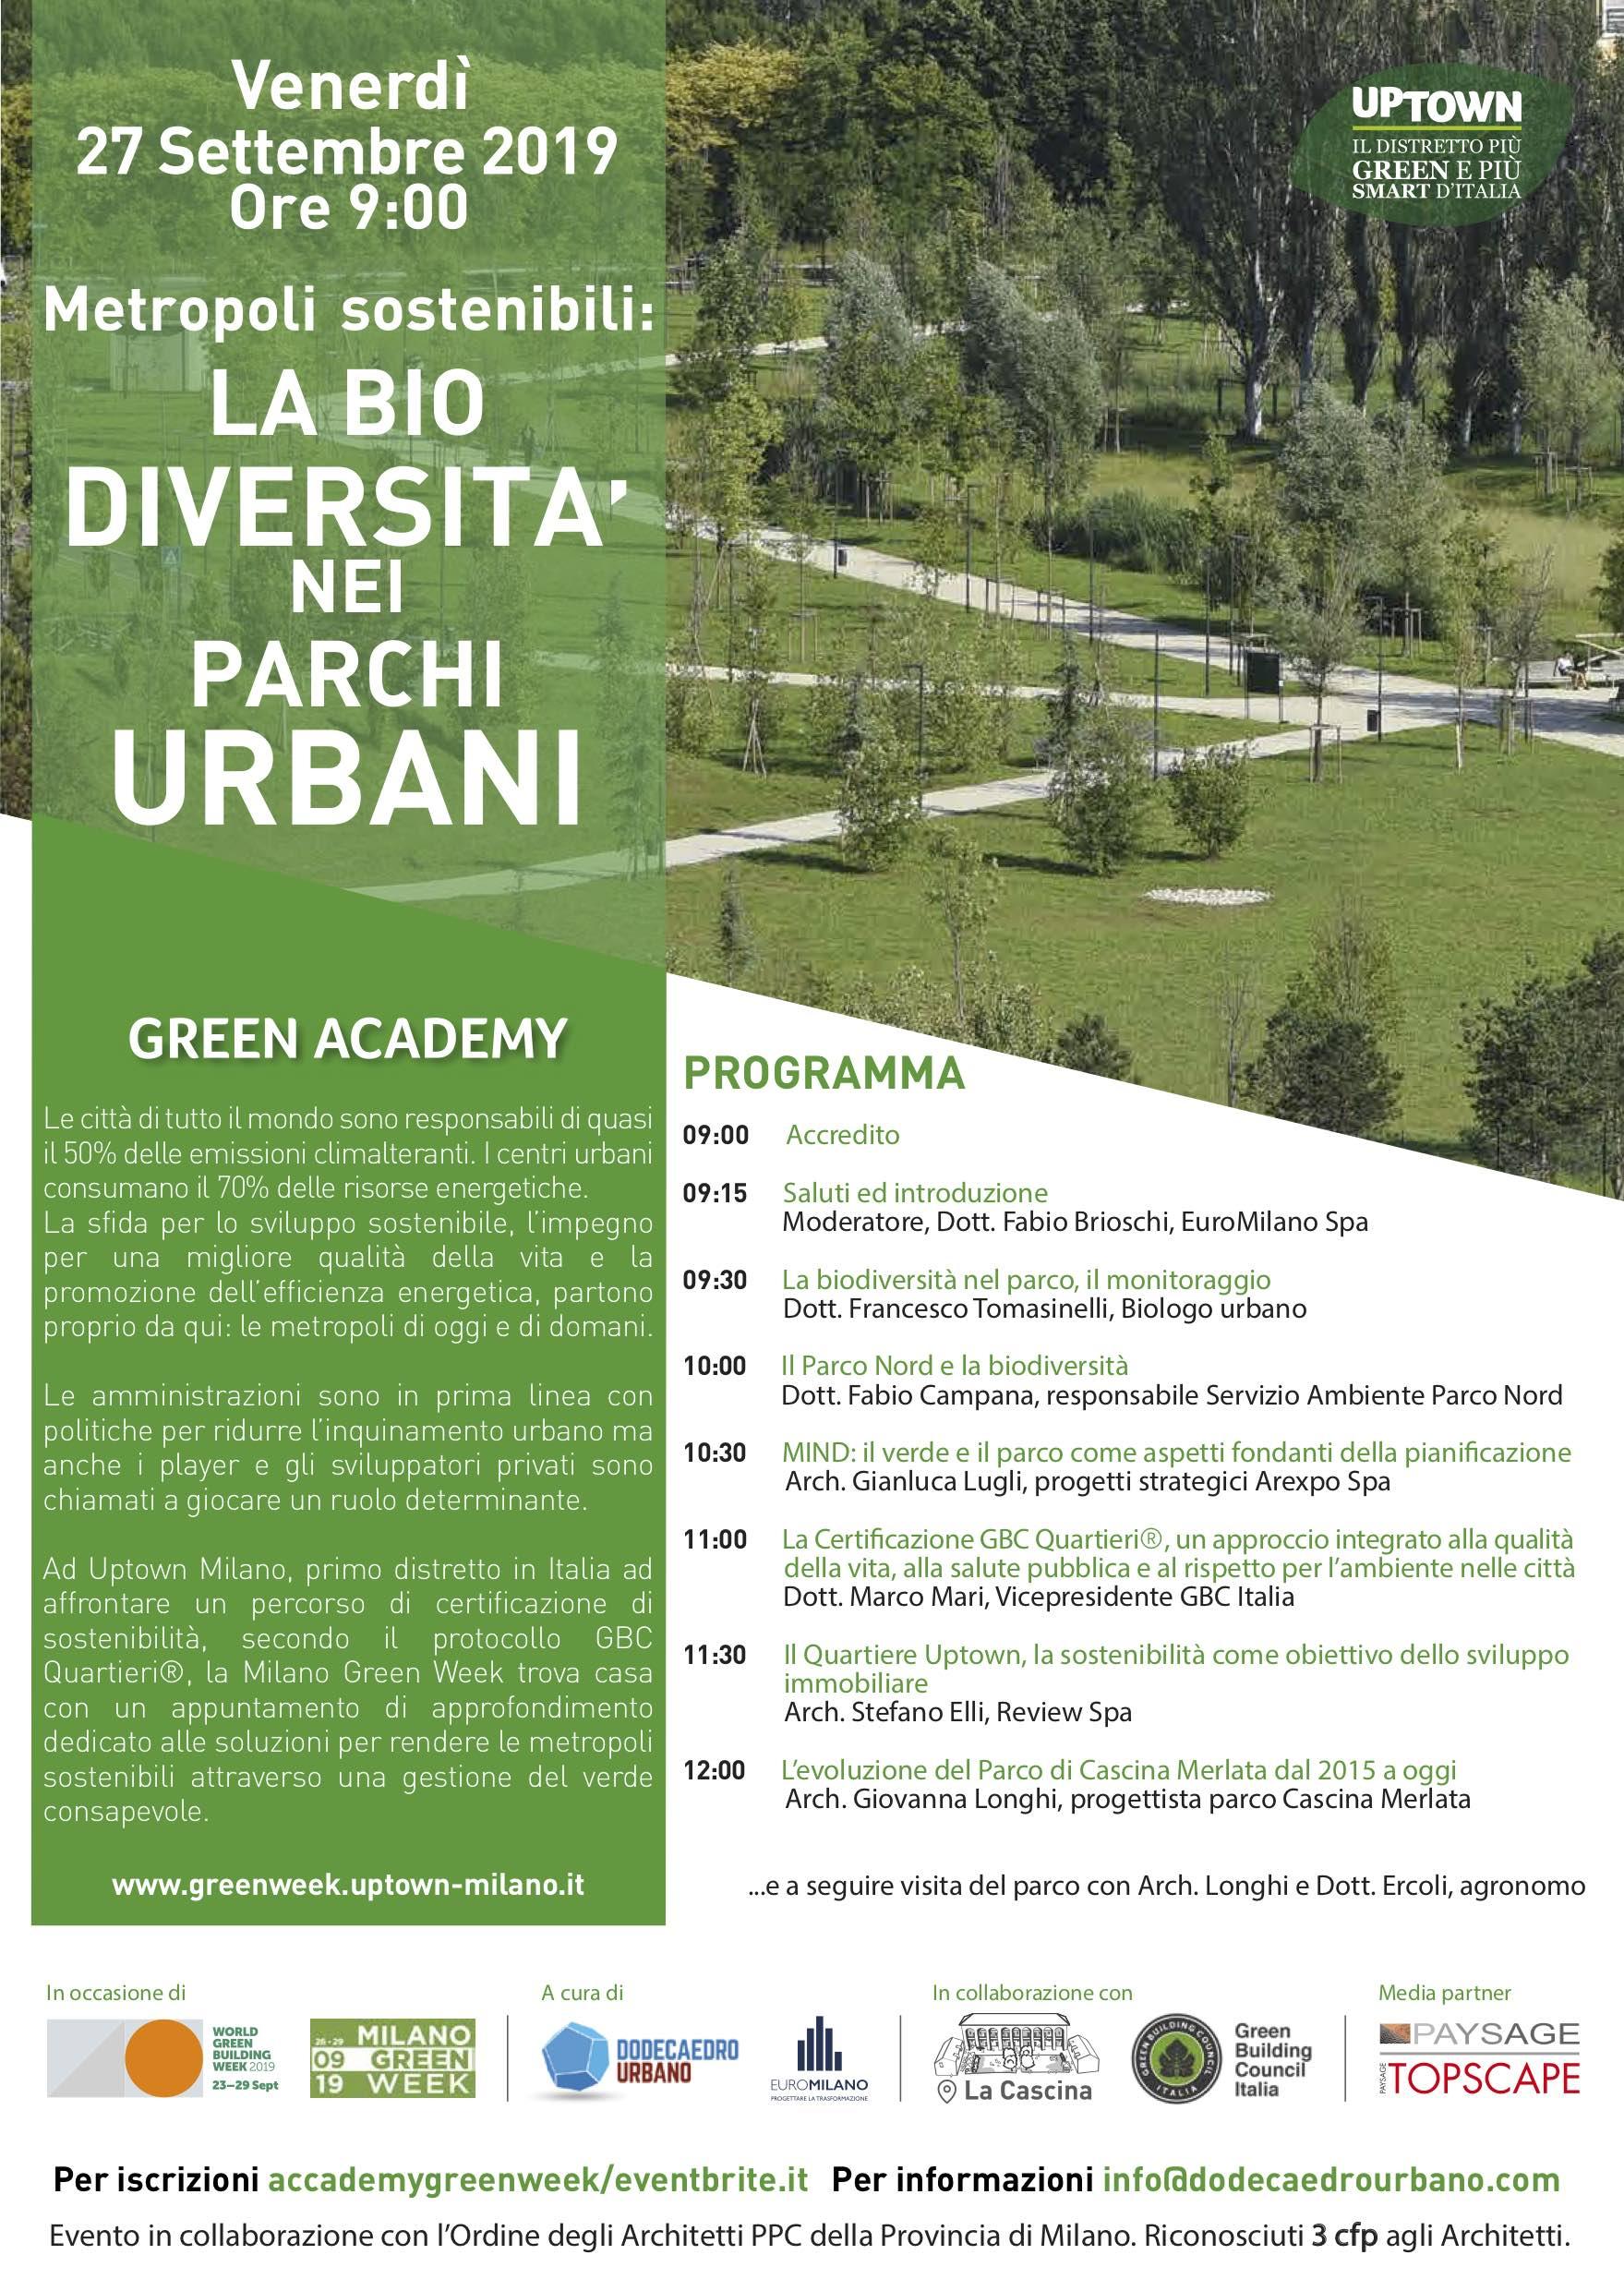 Locandina Greenweek